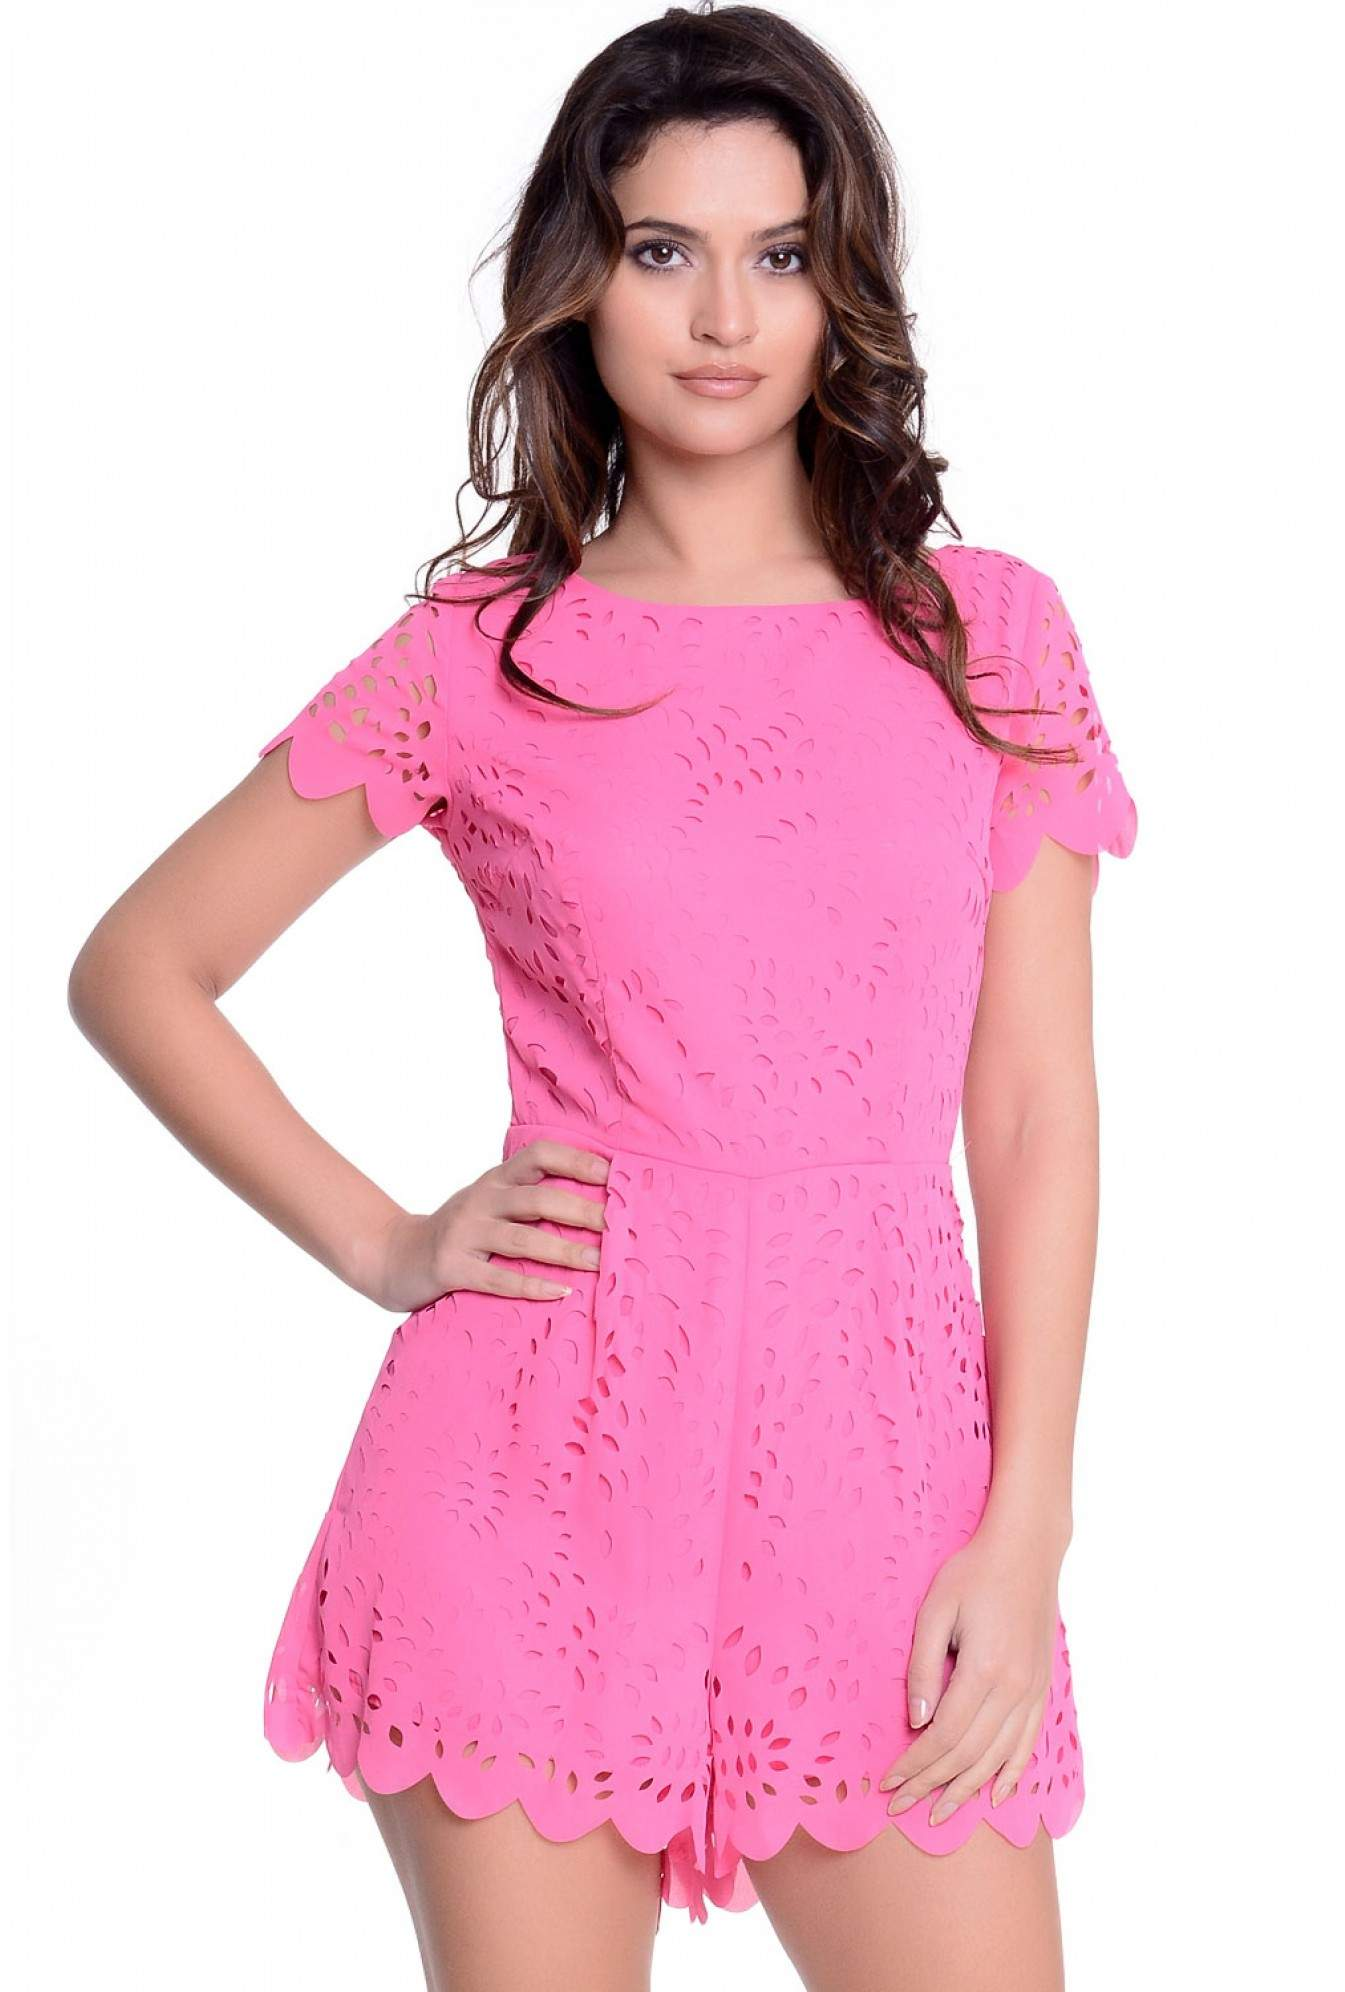 82b56ff486b AX Paris Teela Allover Laser Cut Playsuit in Pink